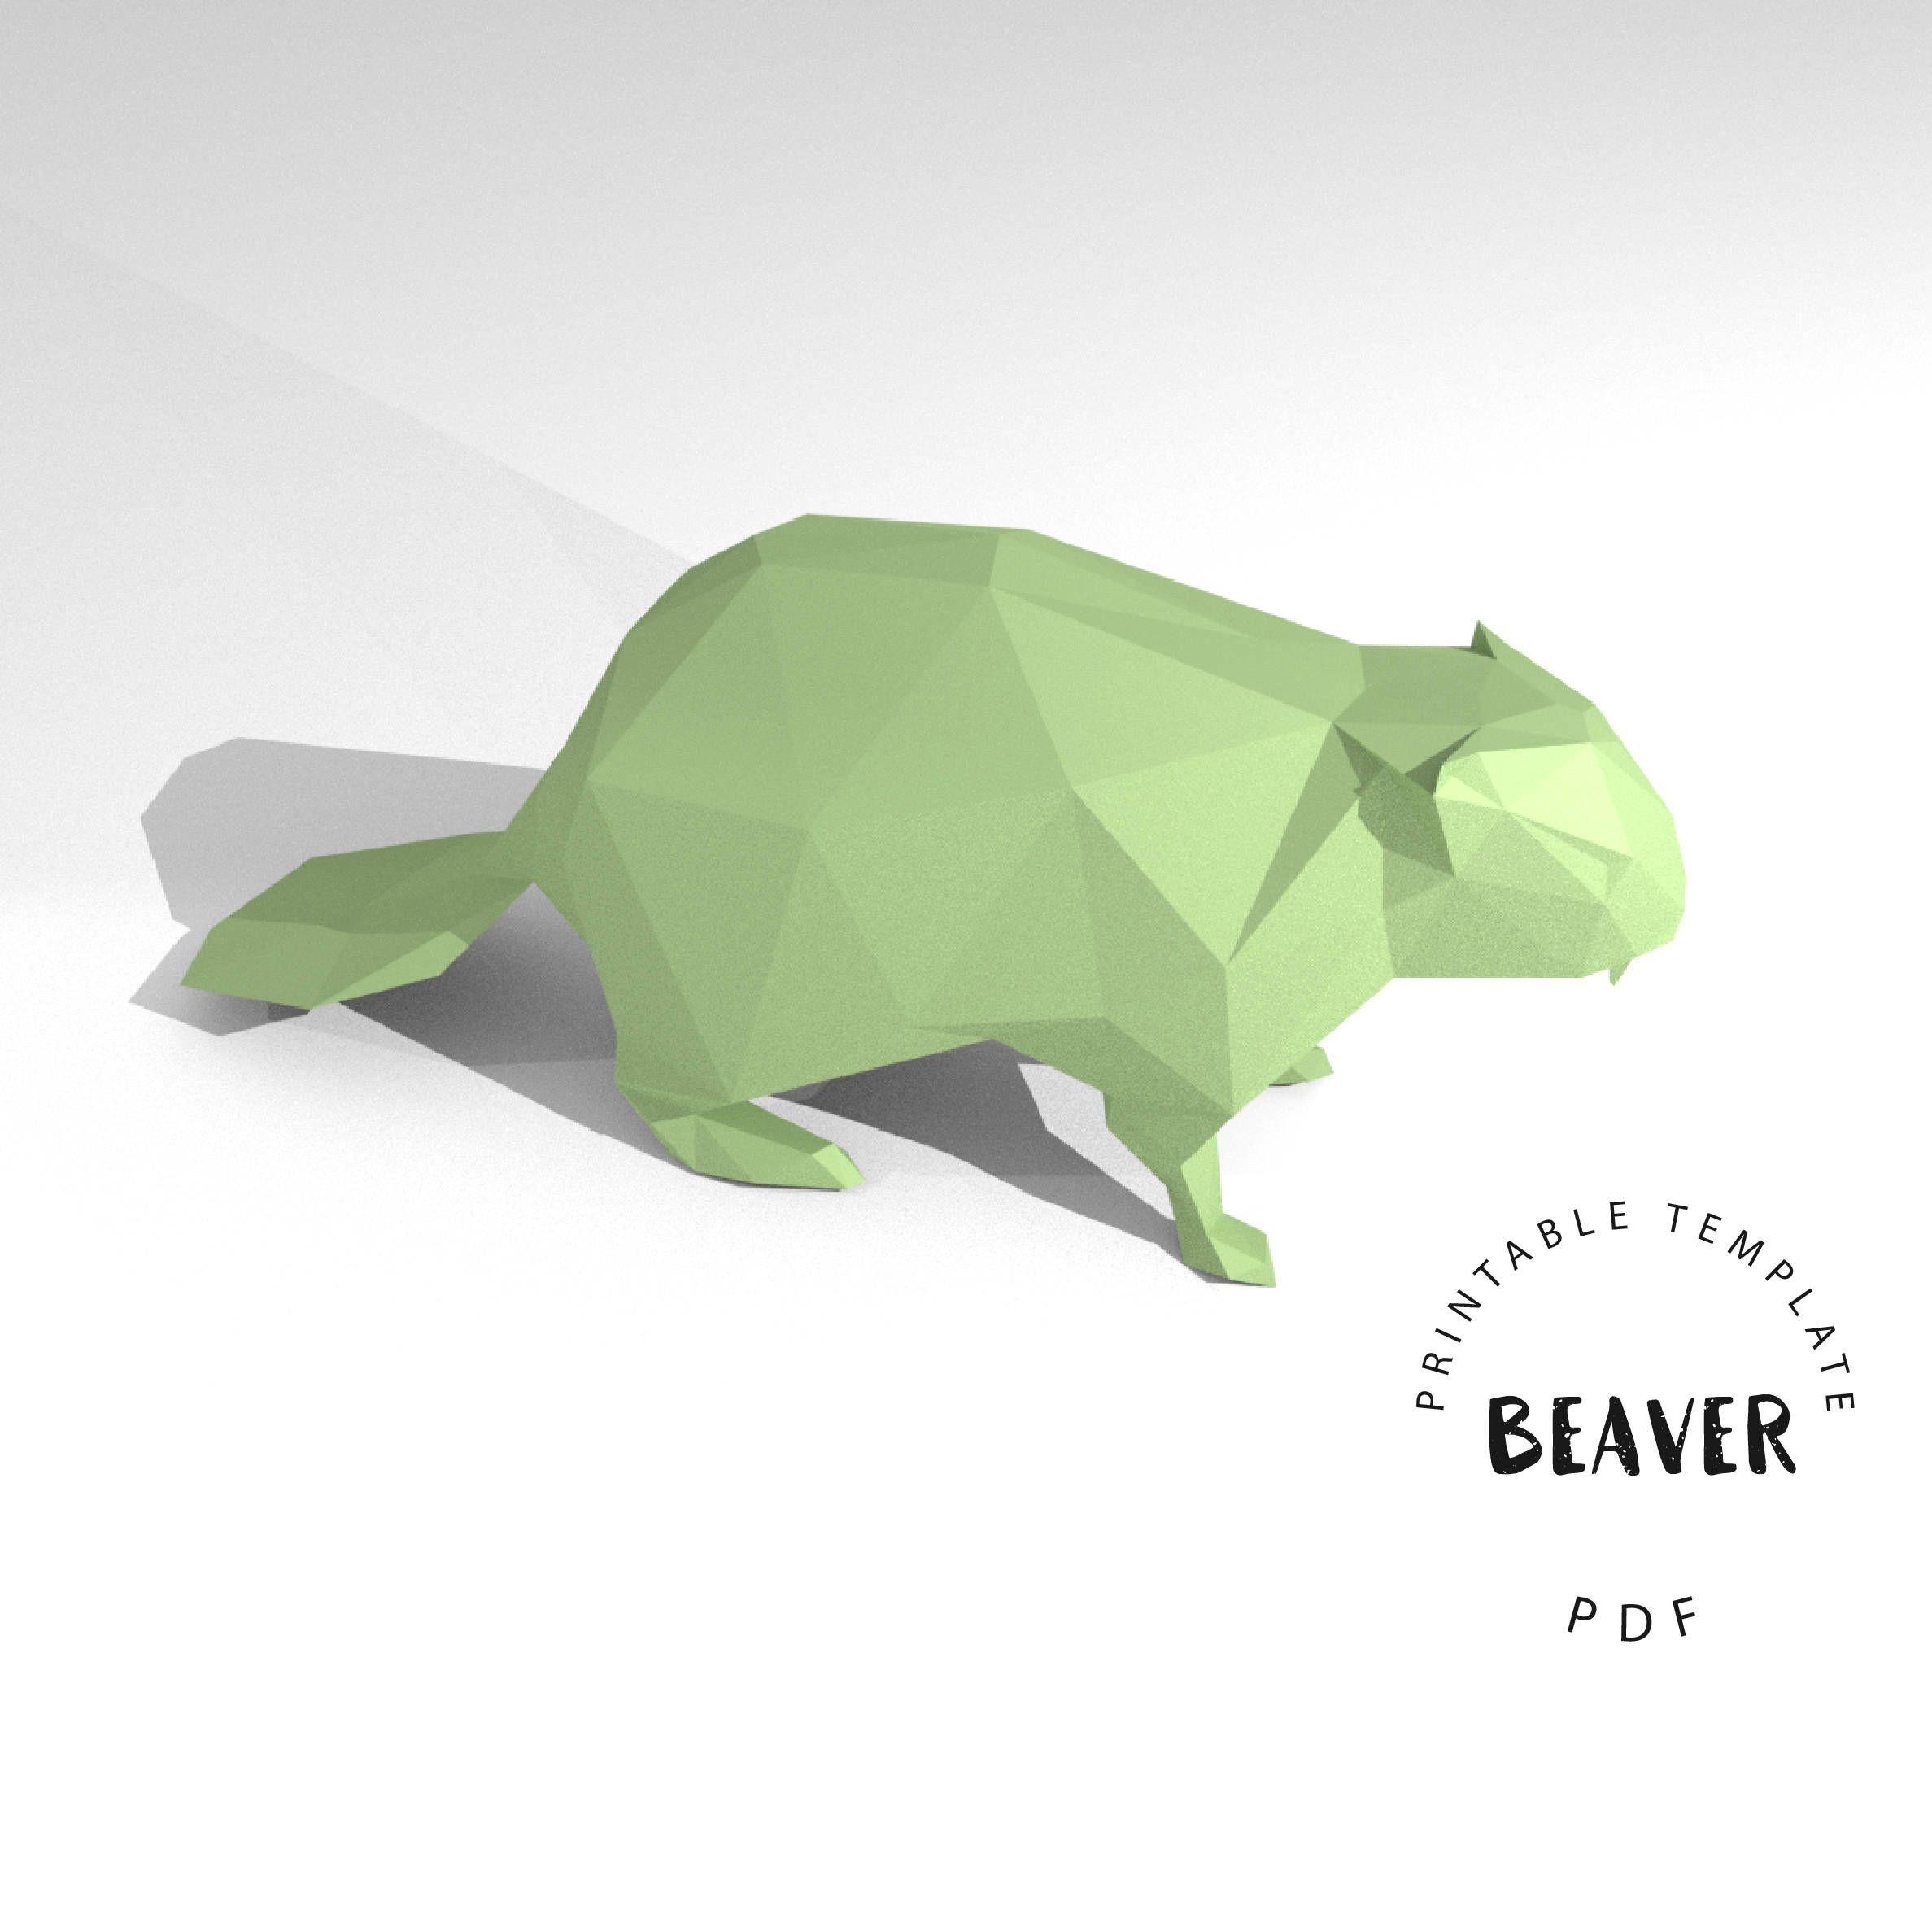 Papercraft 3d Printable Diy Template Pdf Beaver Low Poly Paper Model Template